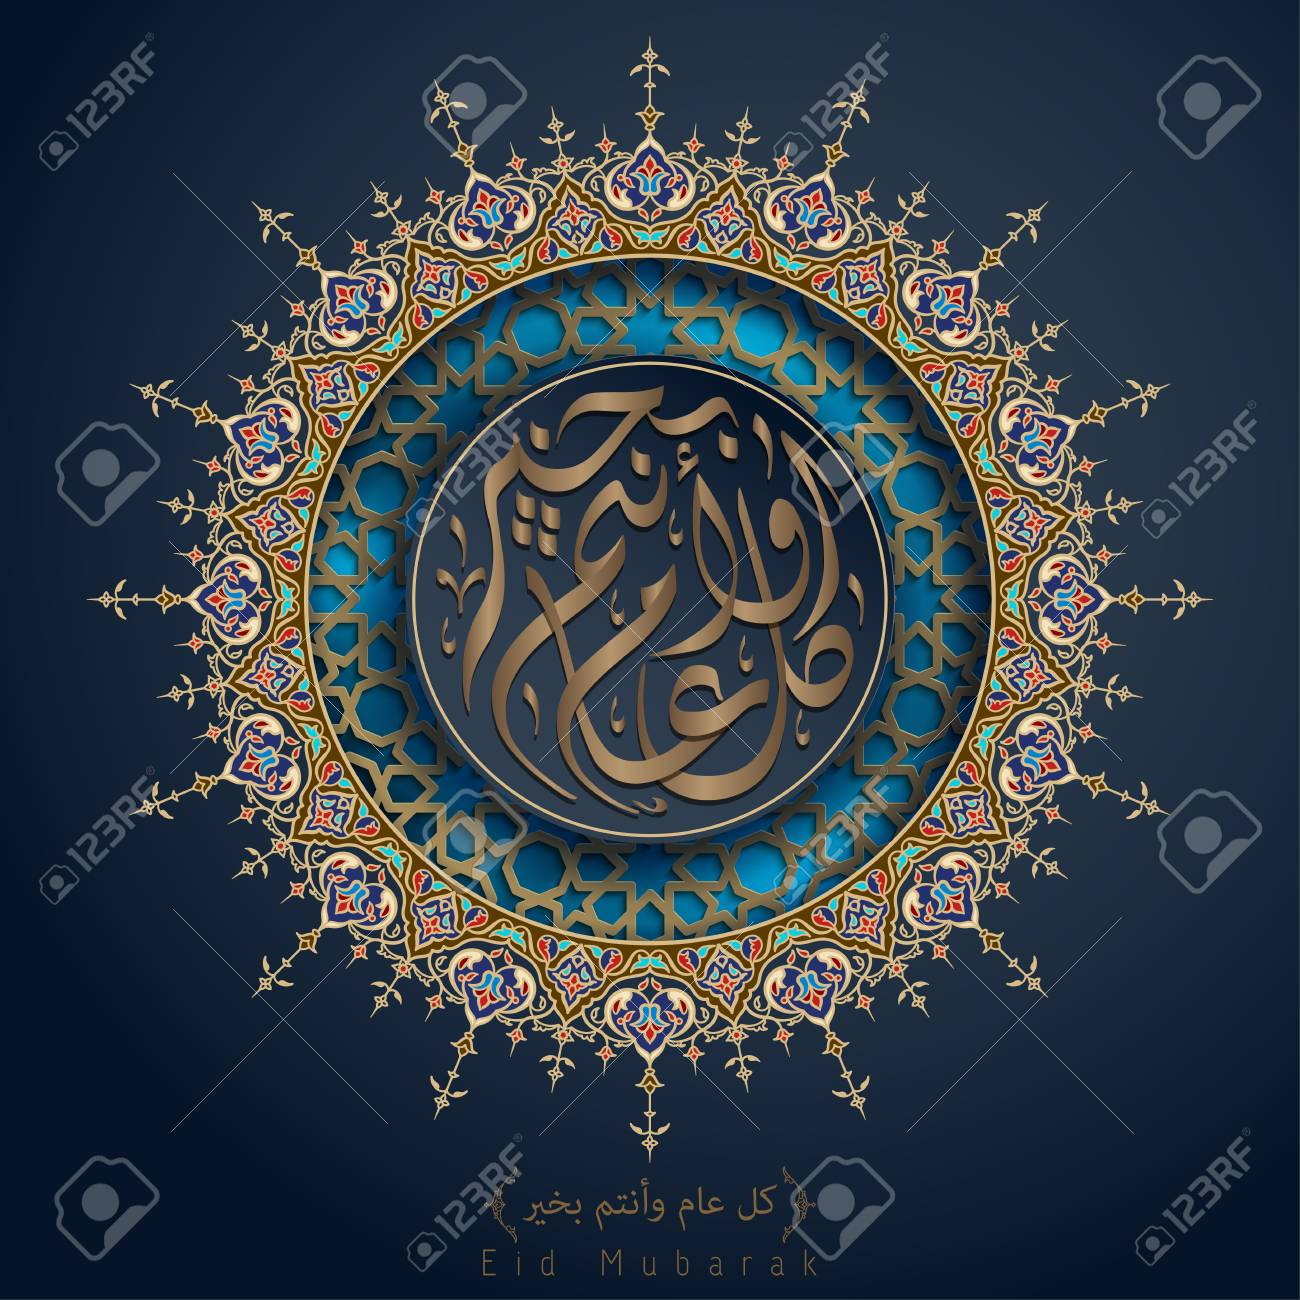 Eid Mubarak Greeting In Arabic Calligraphy With Floral Arabic